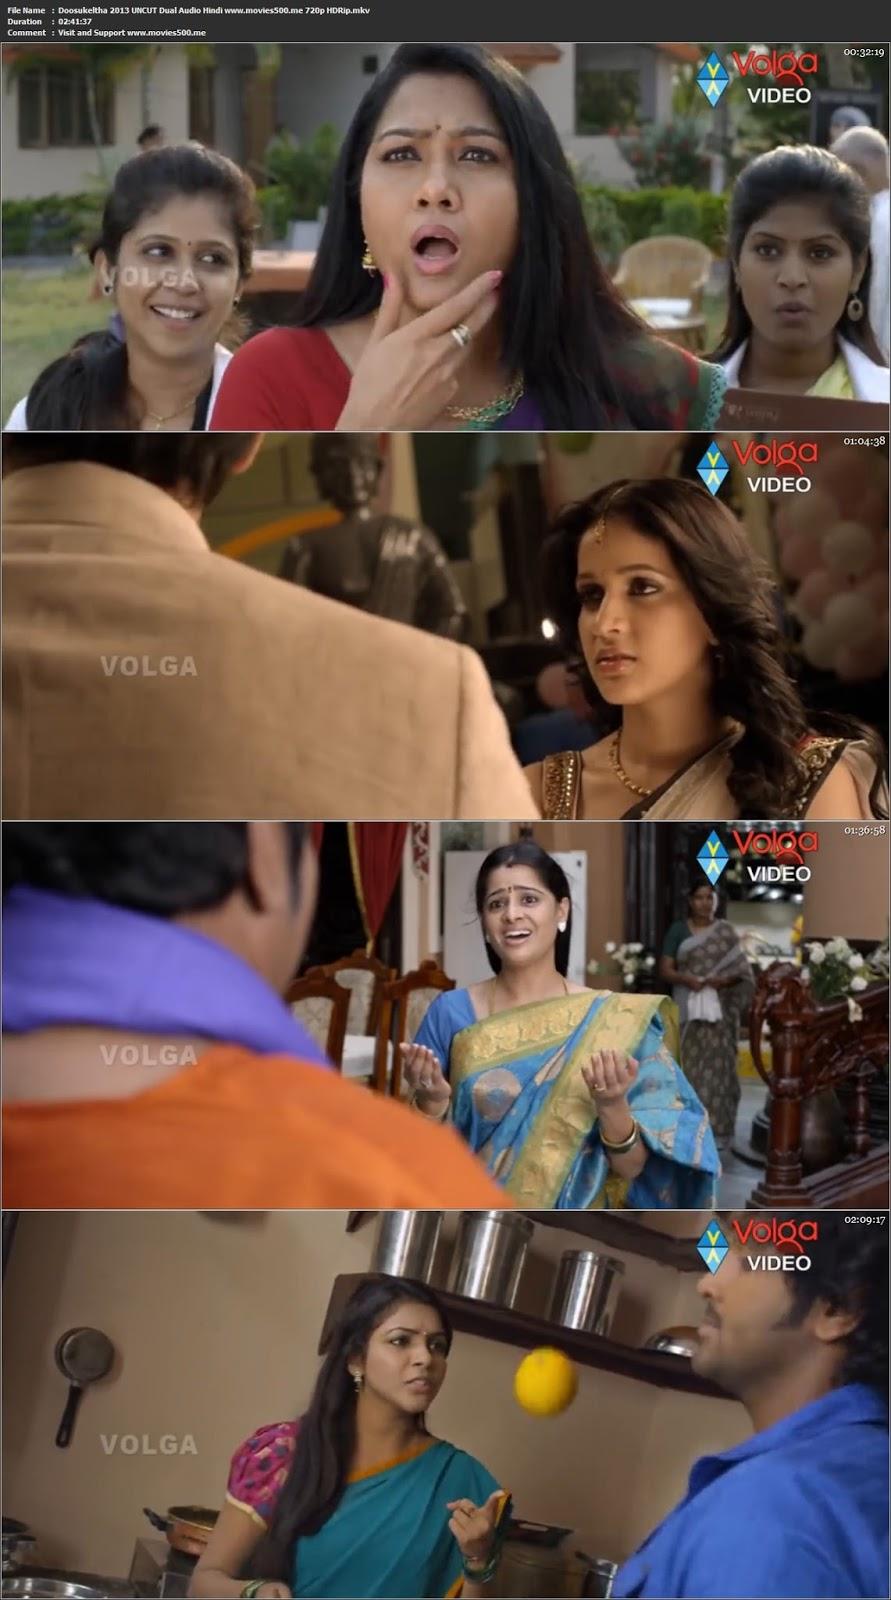 Doosukeltha 2013 UNCUT Dual Audio Hindi HDRip 720p at freedomcopy.com